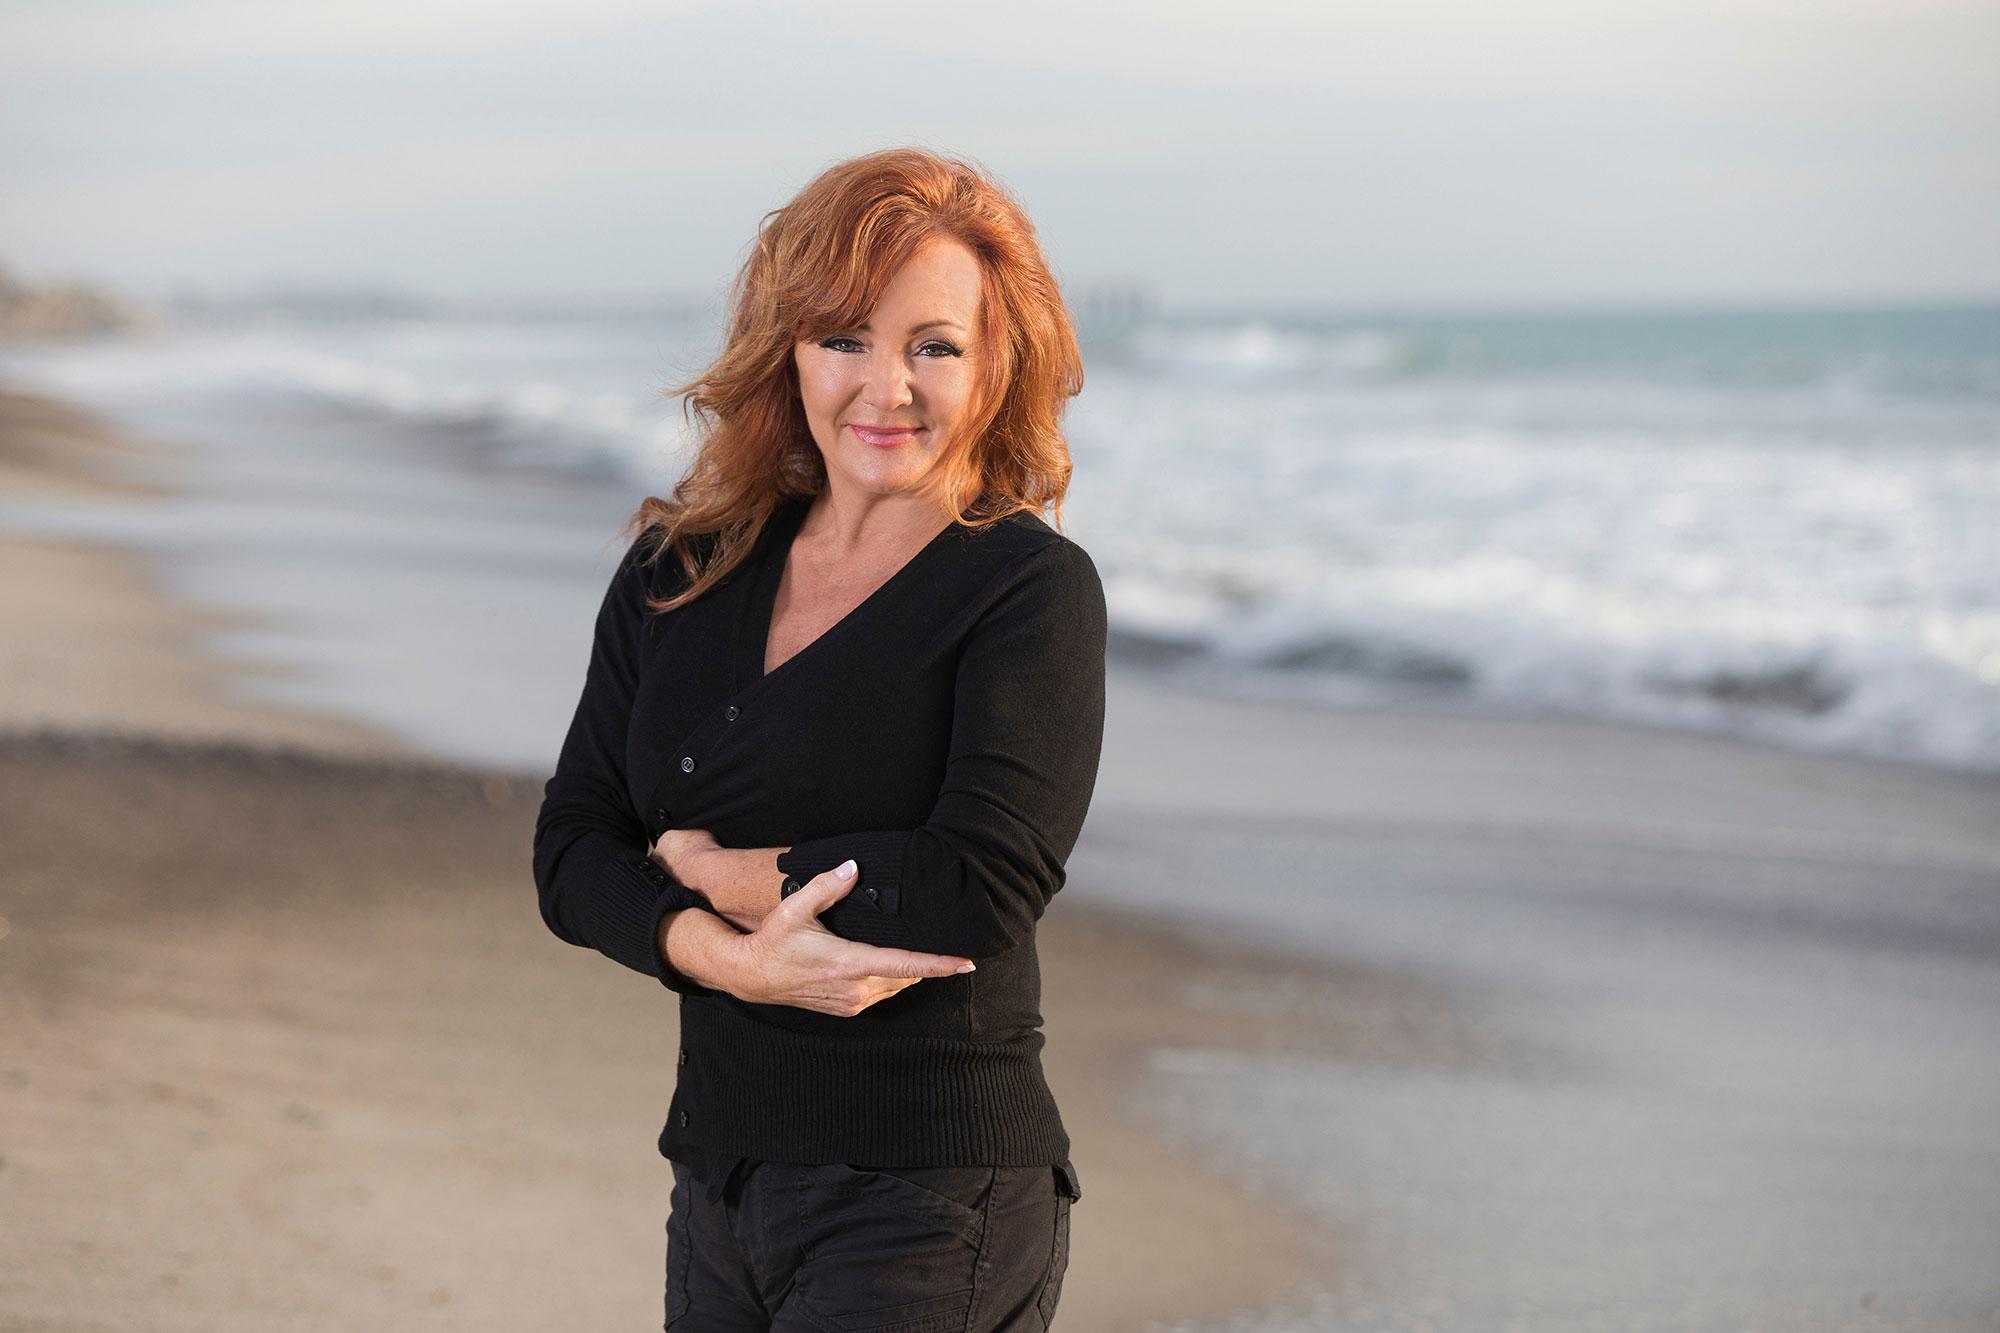 Laura Gisborne - Beach